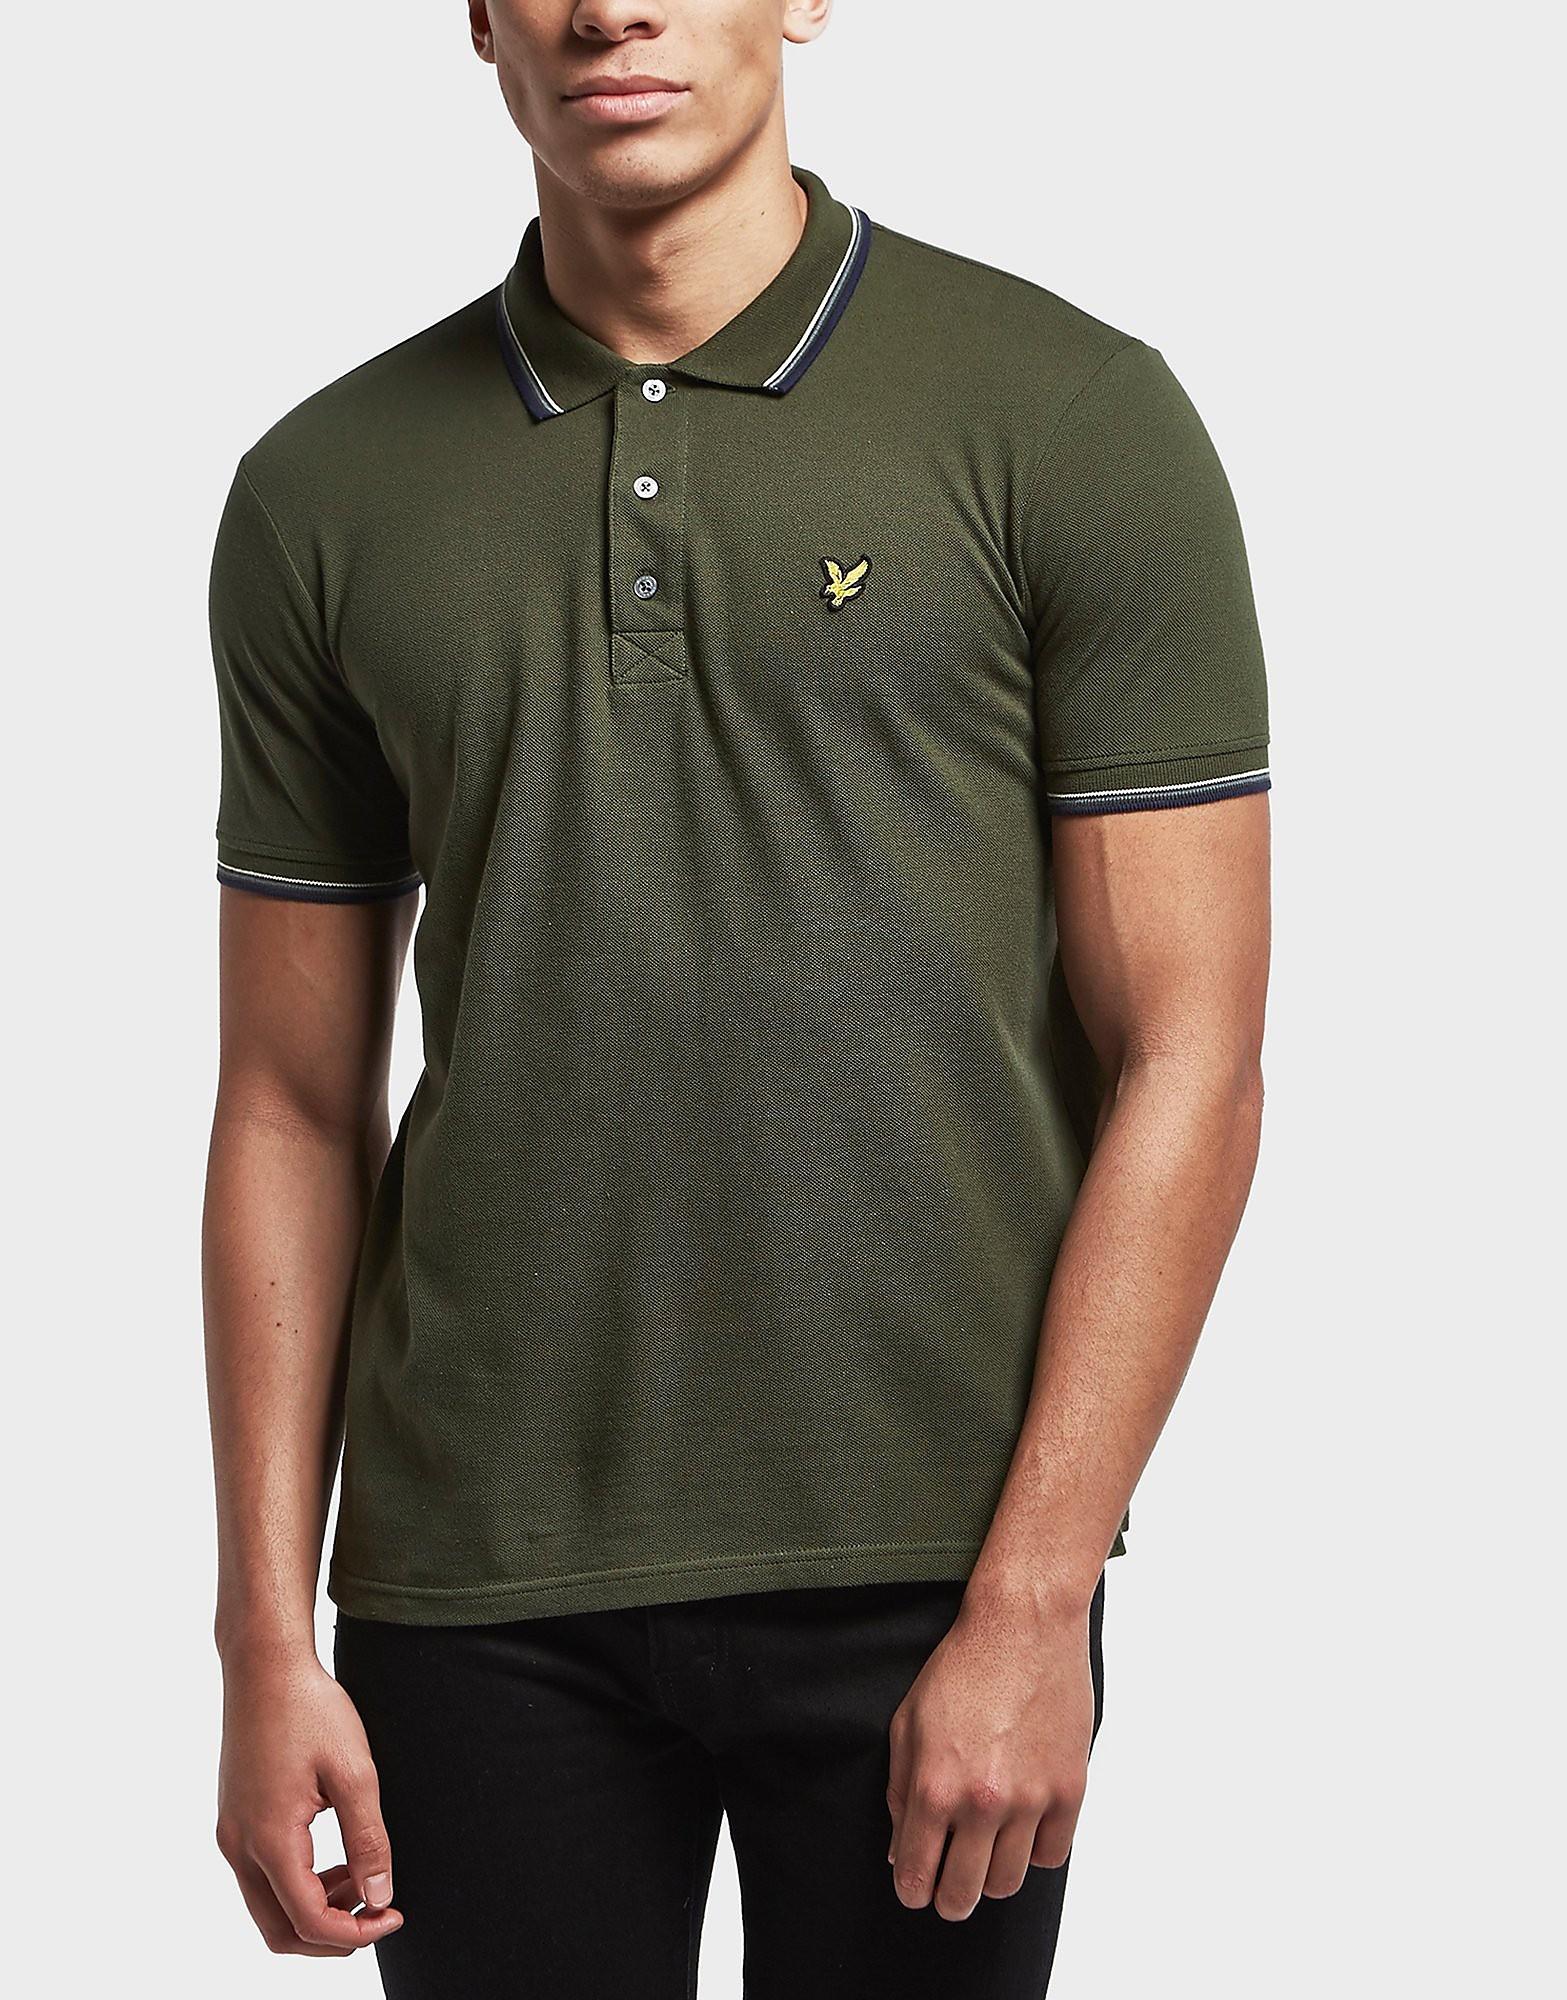 Lyle & Scott Tipped Short Sleeve Polo Shirt